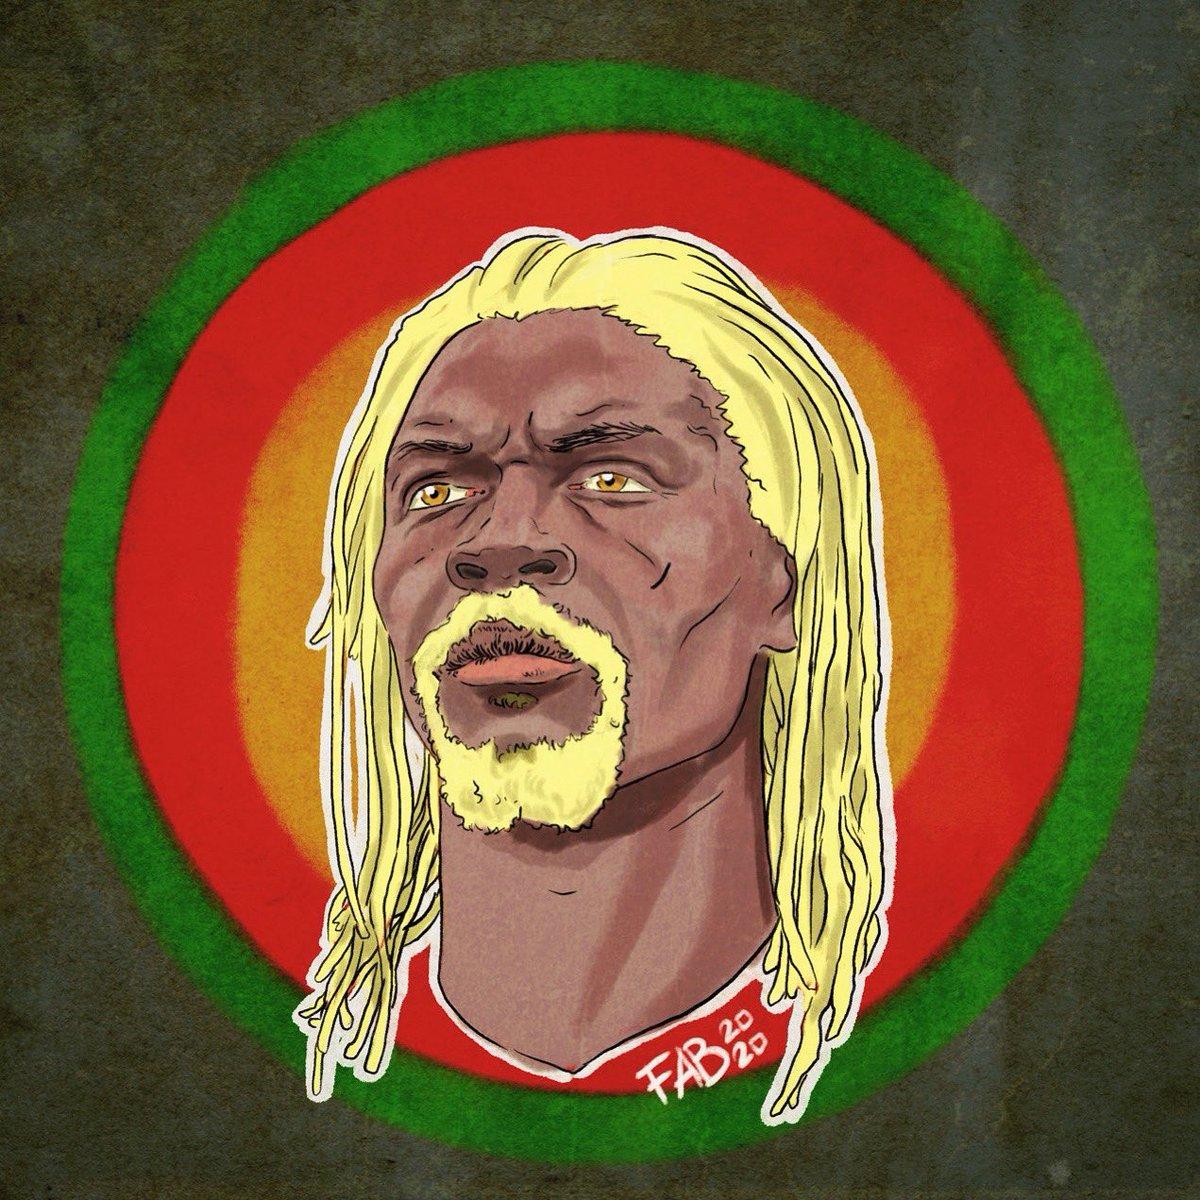 Capitain Rigobert Song. Le Lion indomptable. #camfoot #cameroun #cameroon #RS4 https://t.co/xBM8cki3Vd